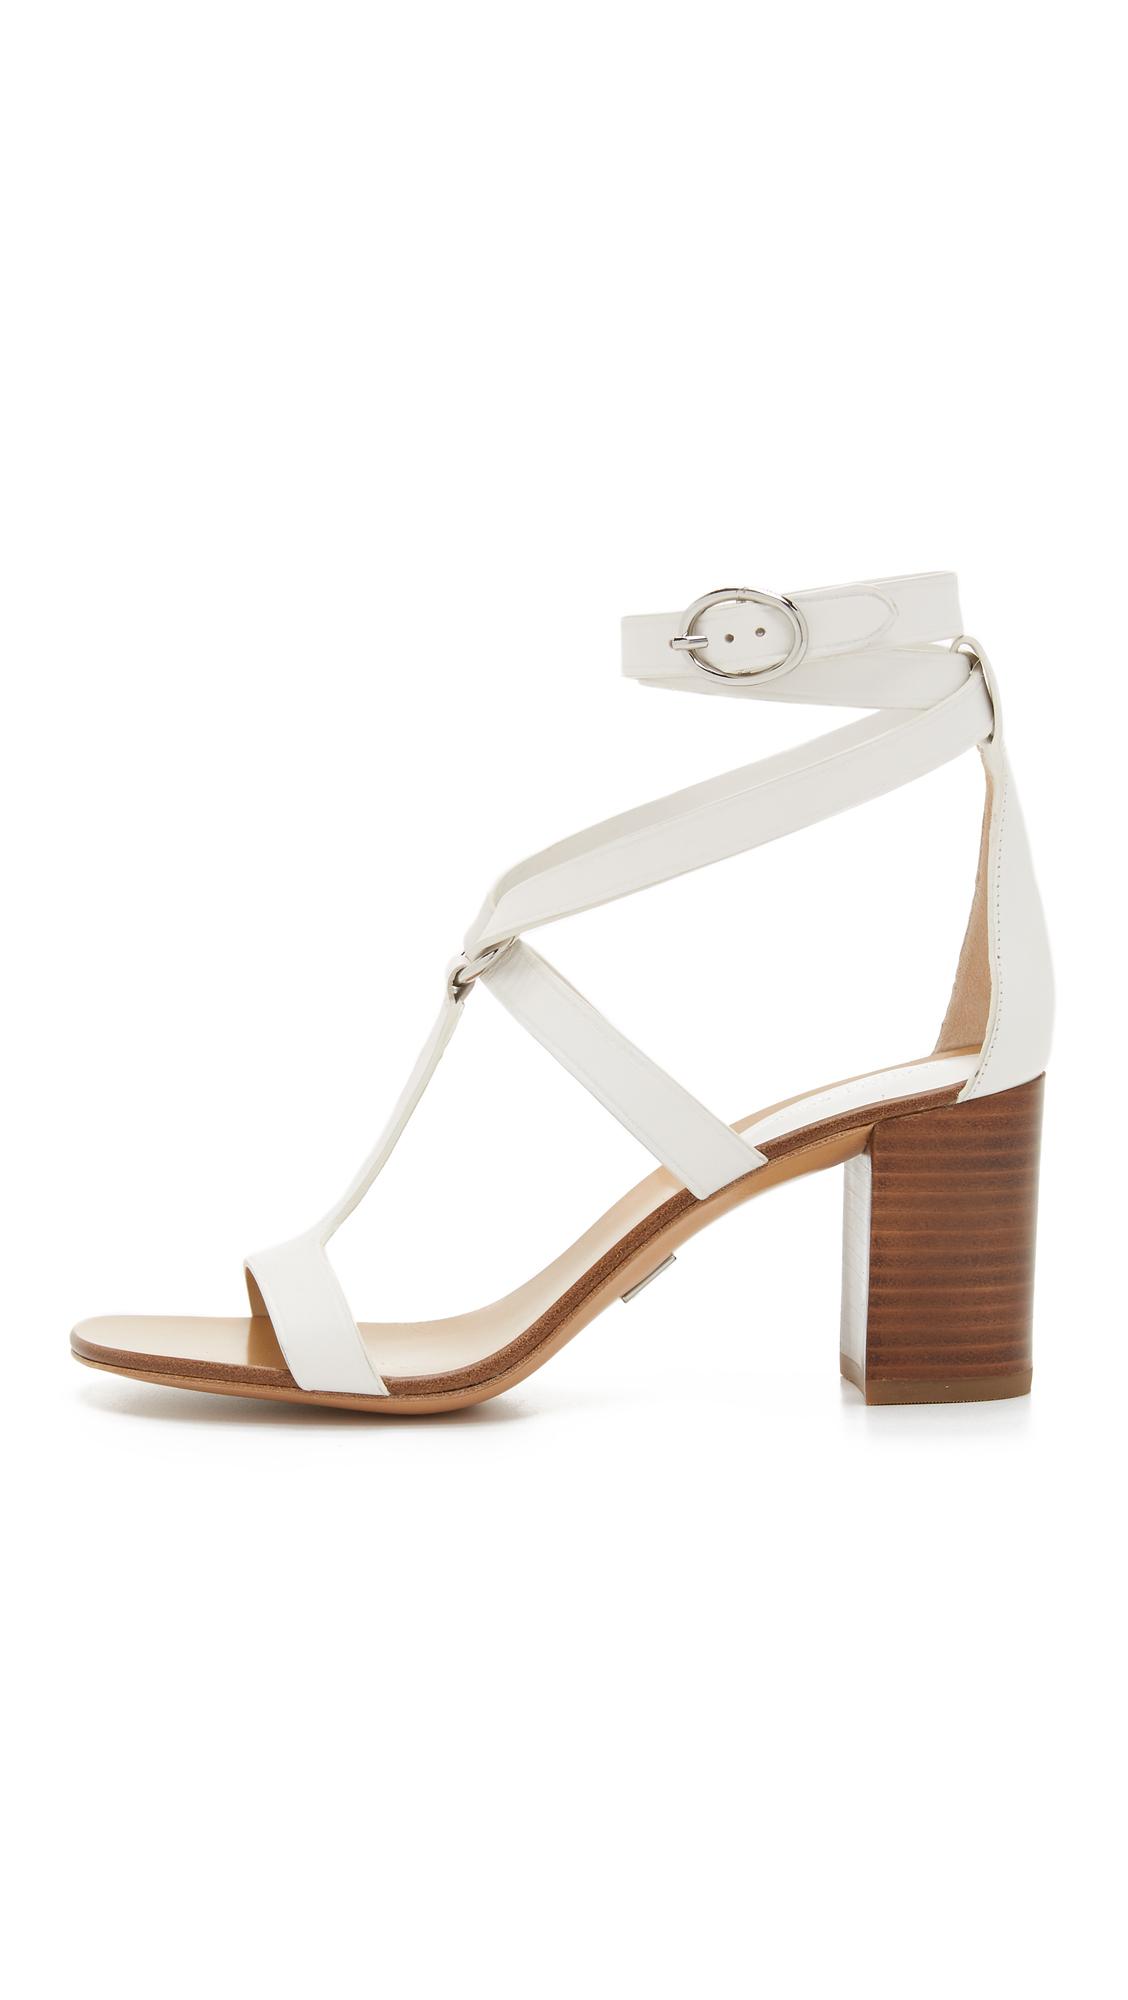 michael kors ellison city sandals in white lyst